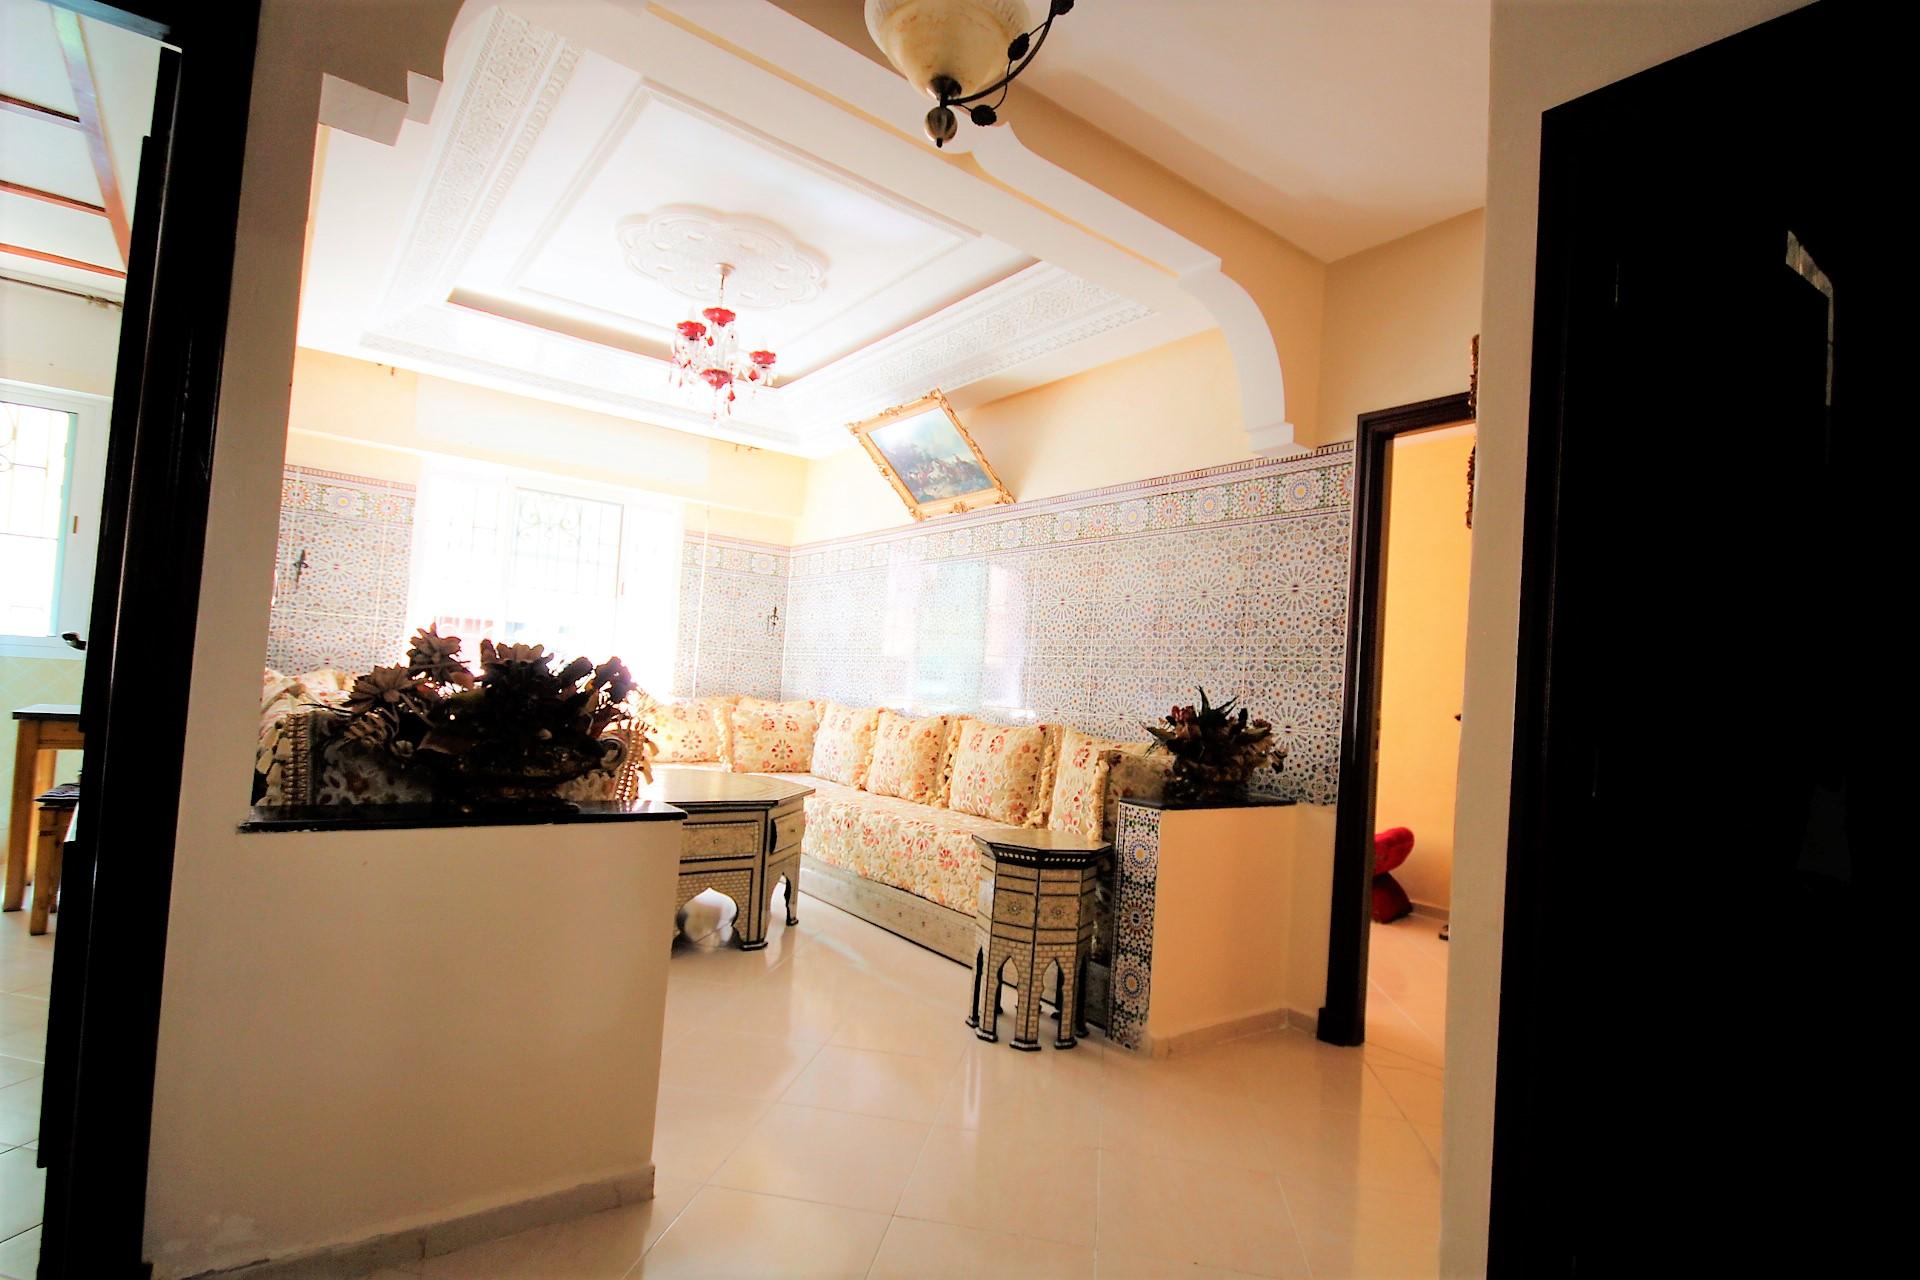 Maroc, Dar bouazza village, vend appartement en duplex bon prix